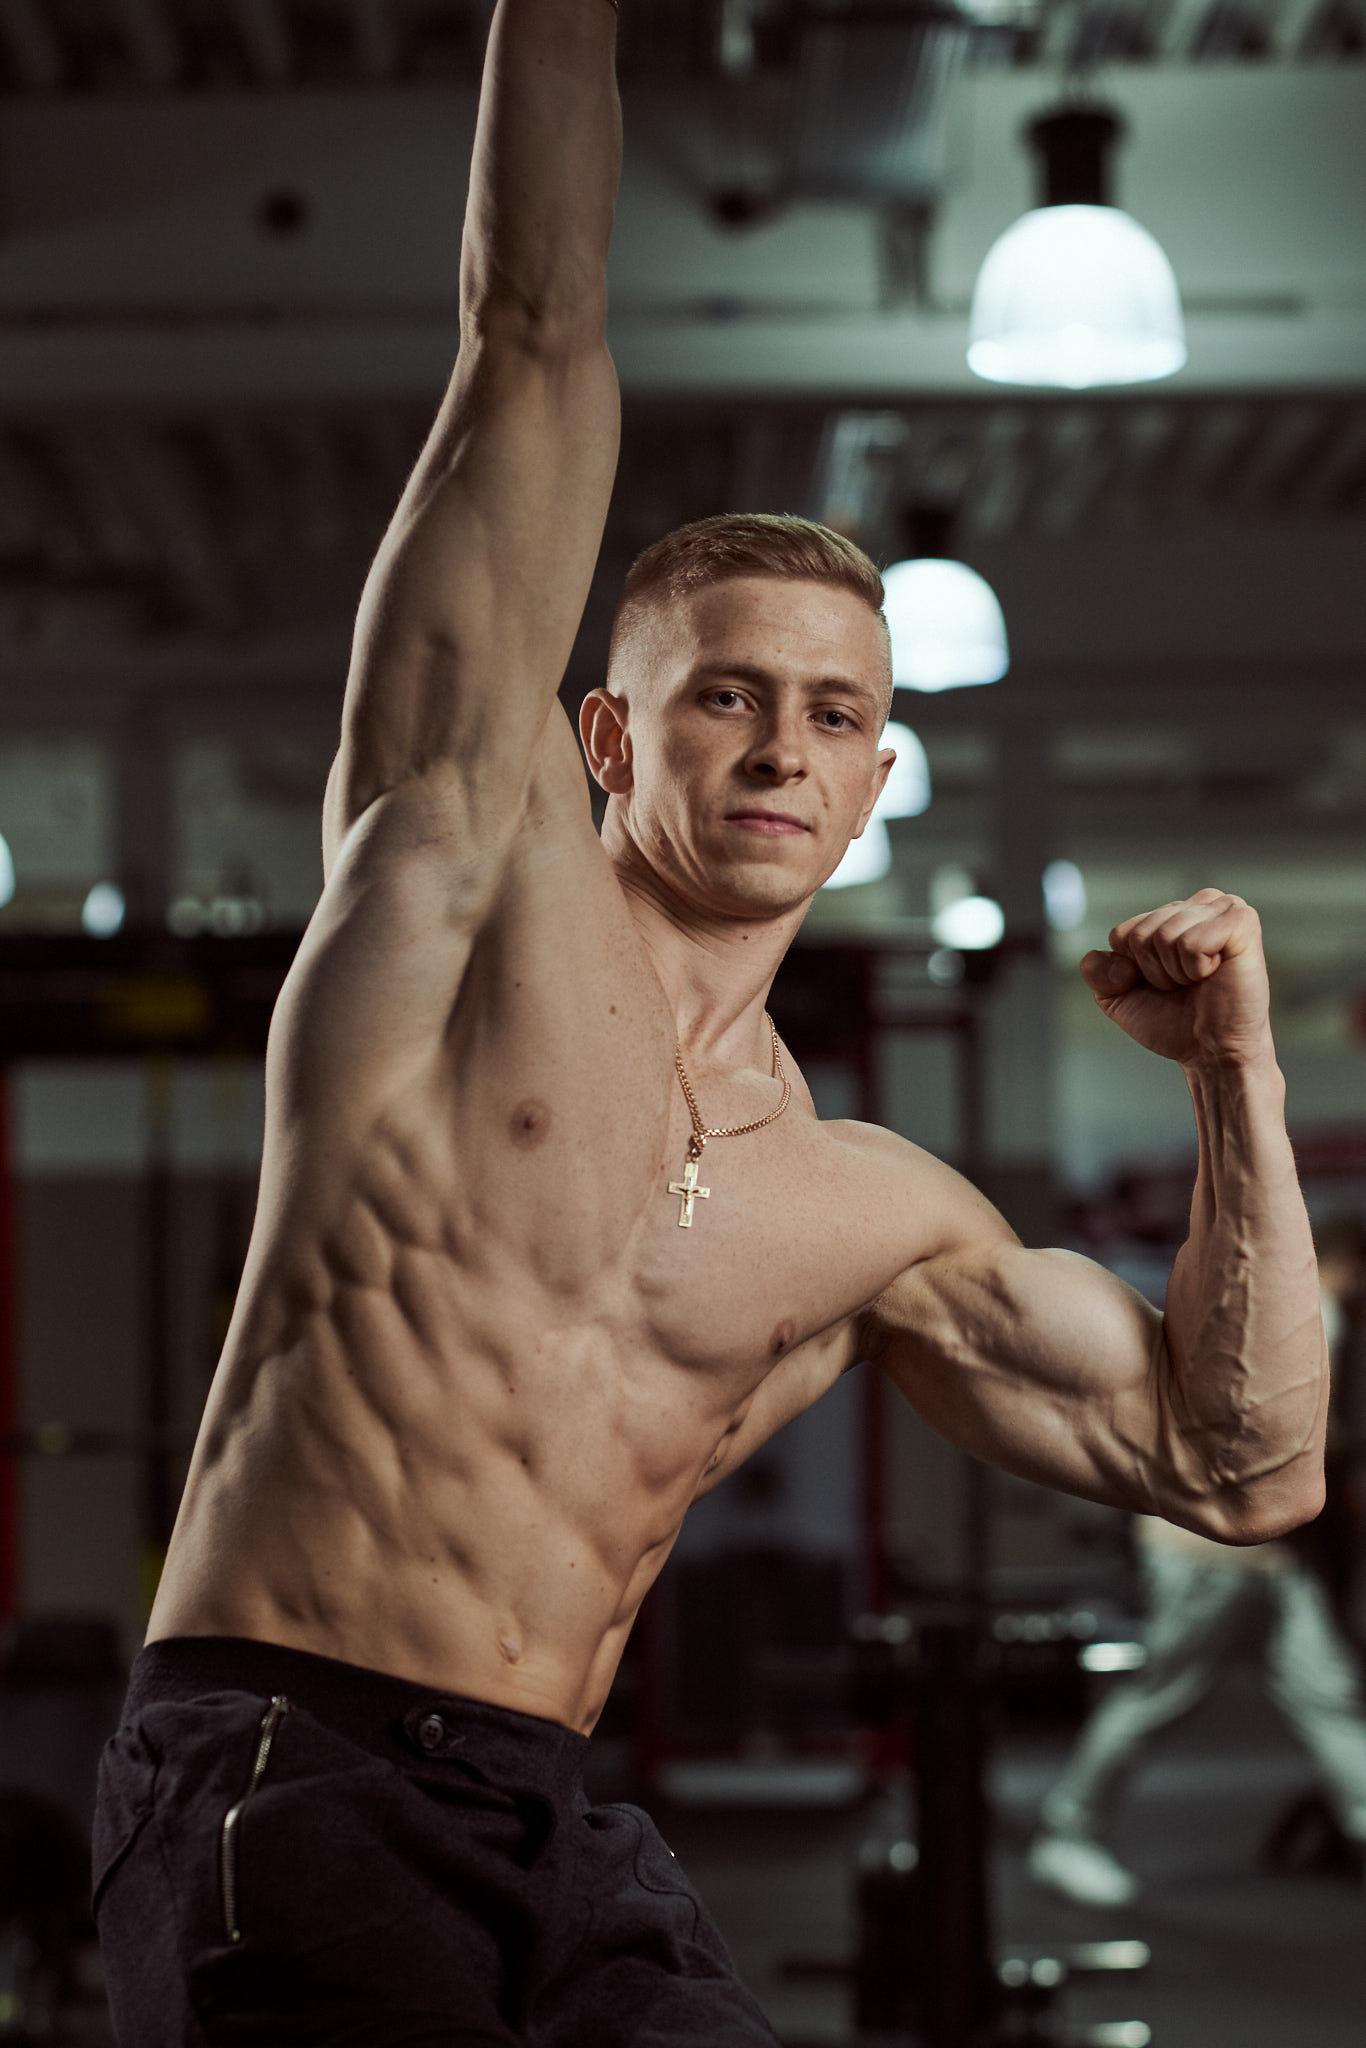 Fitness-Kickboxen